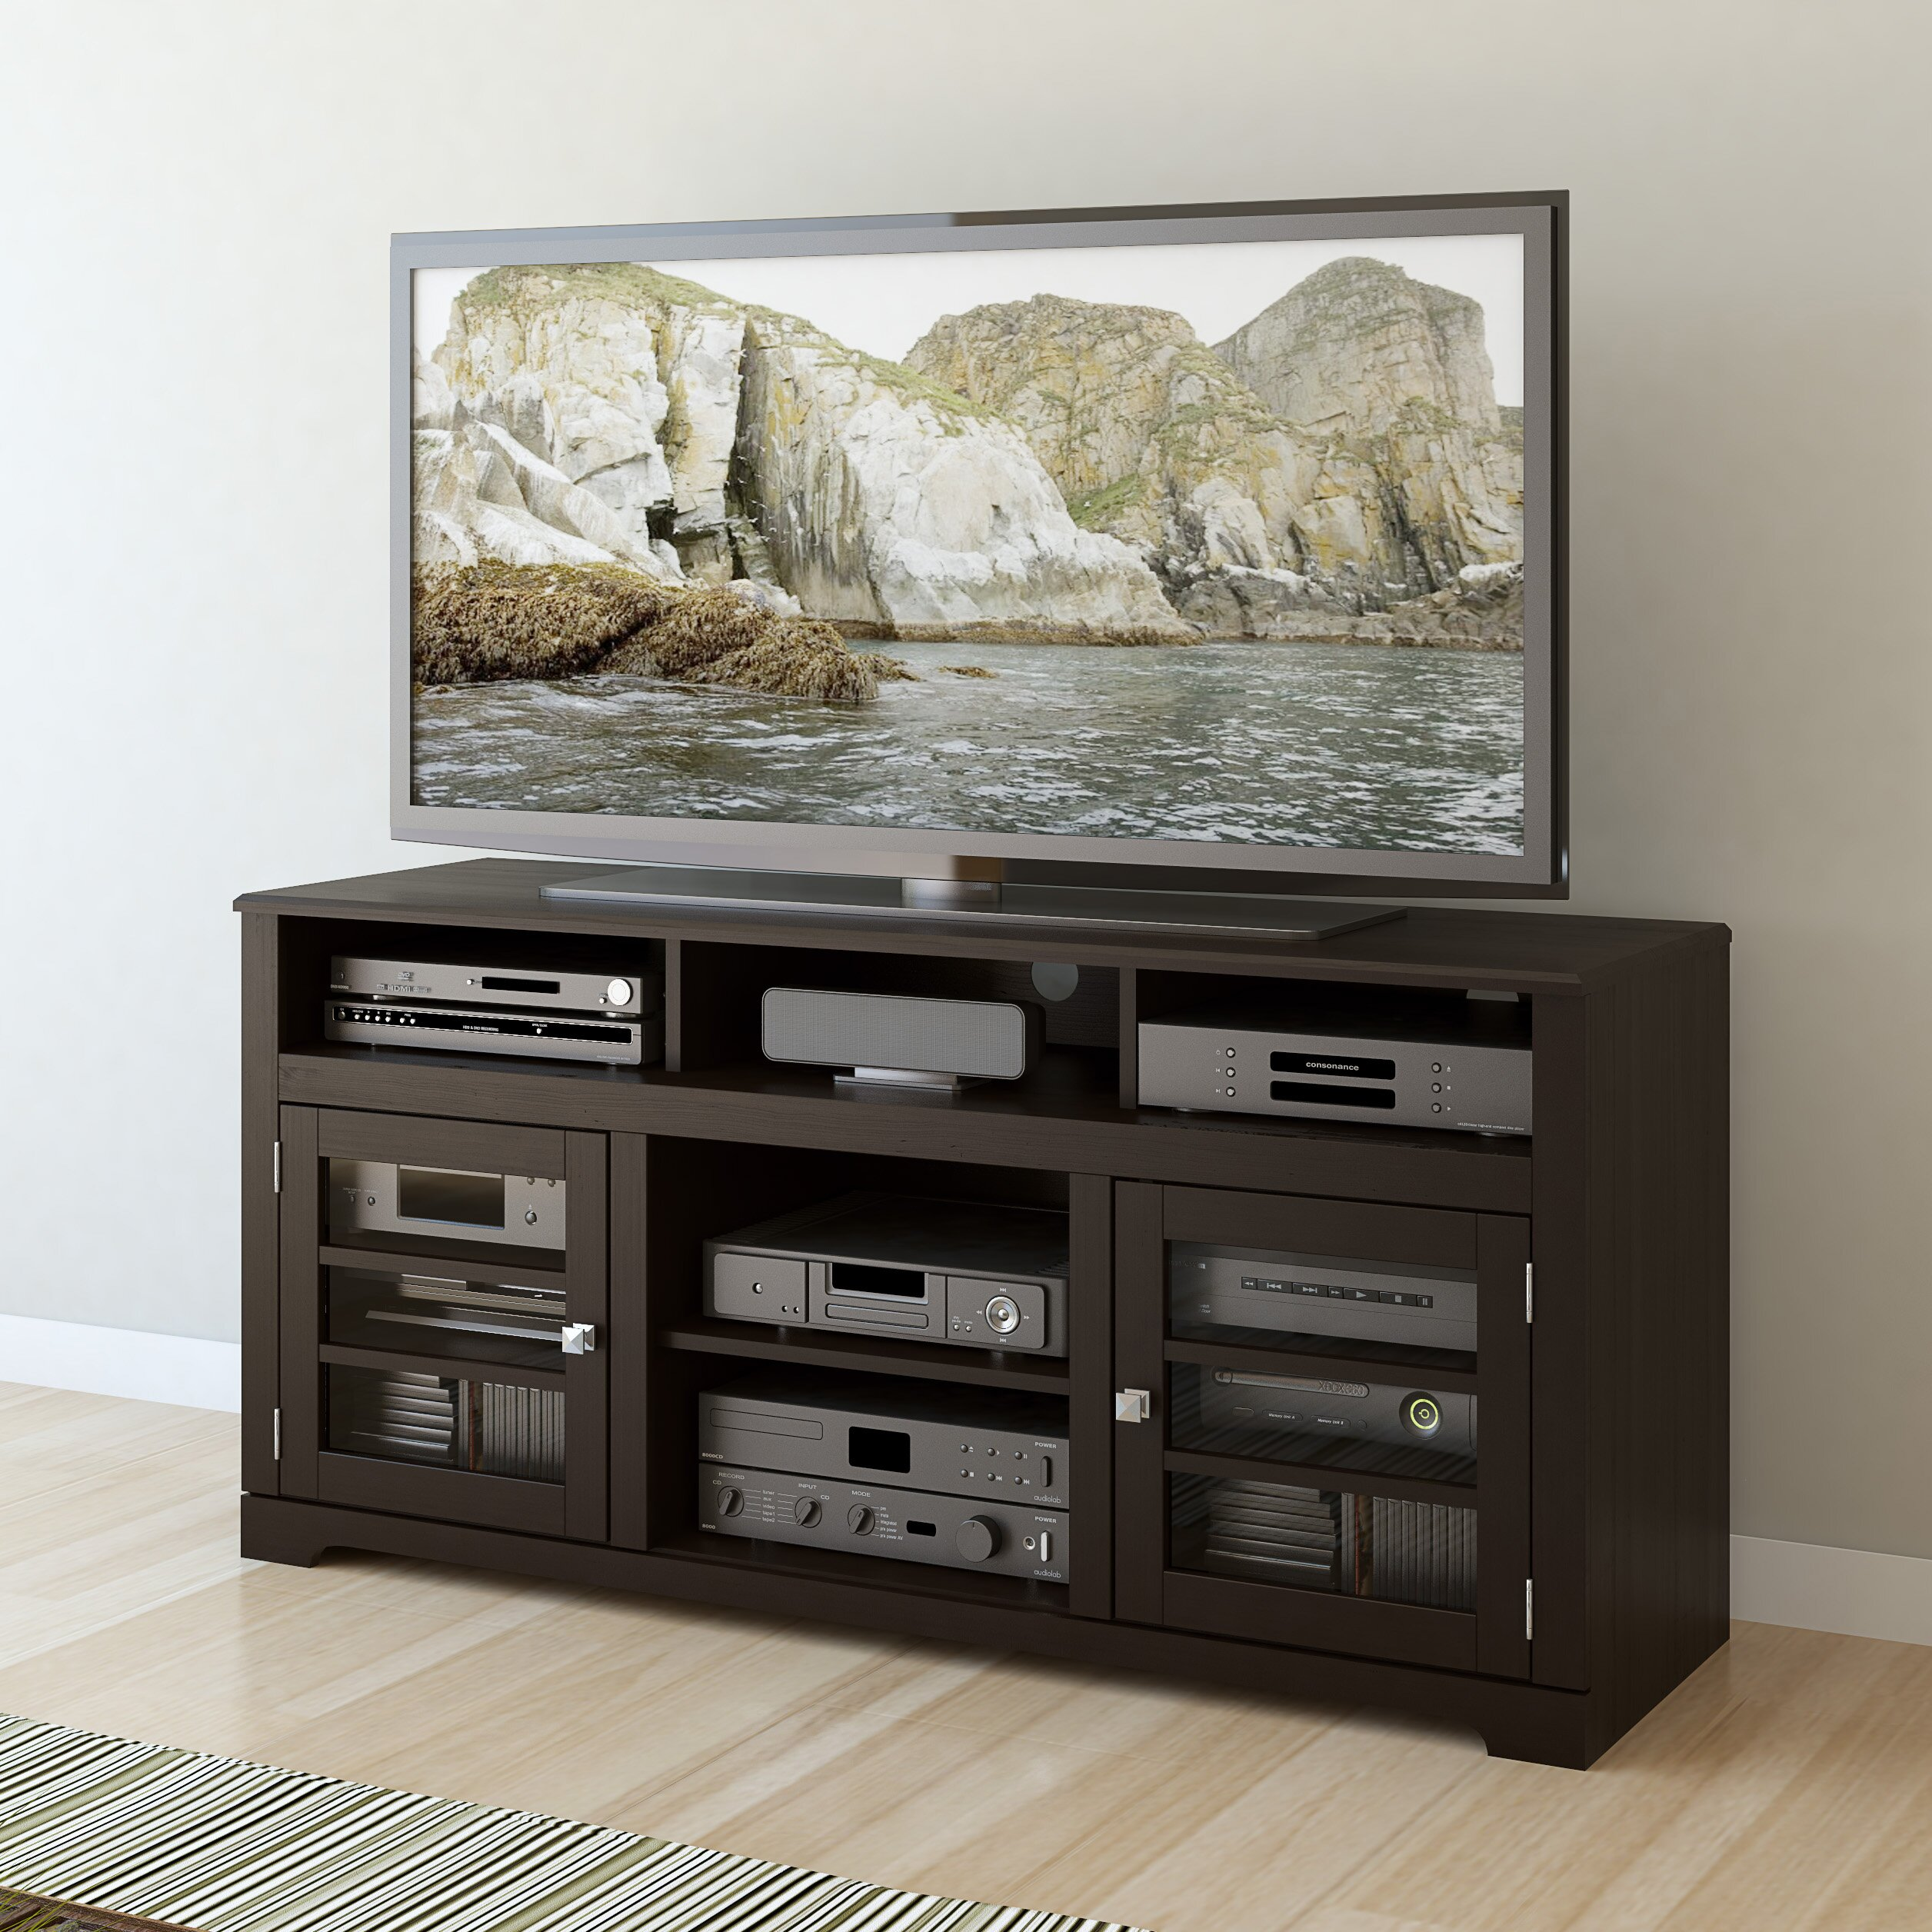 DCOR Design West Lake TV Stand & Reviews